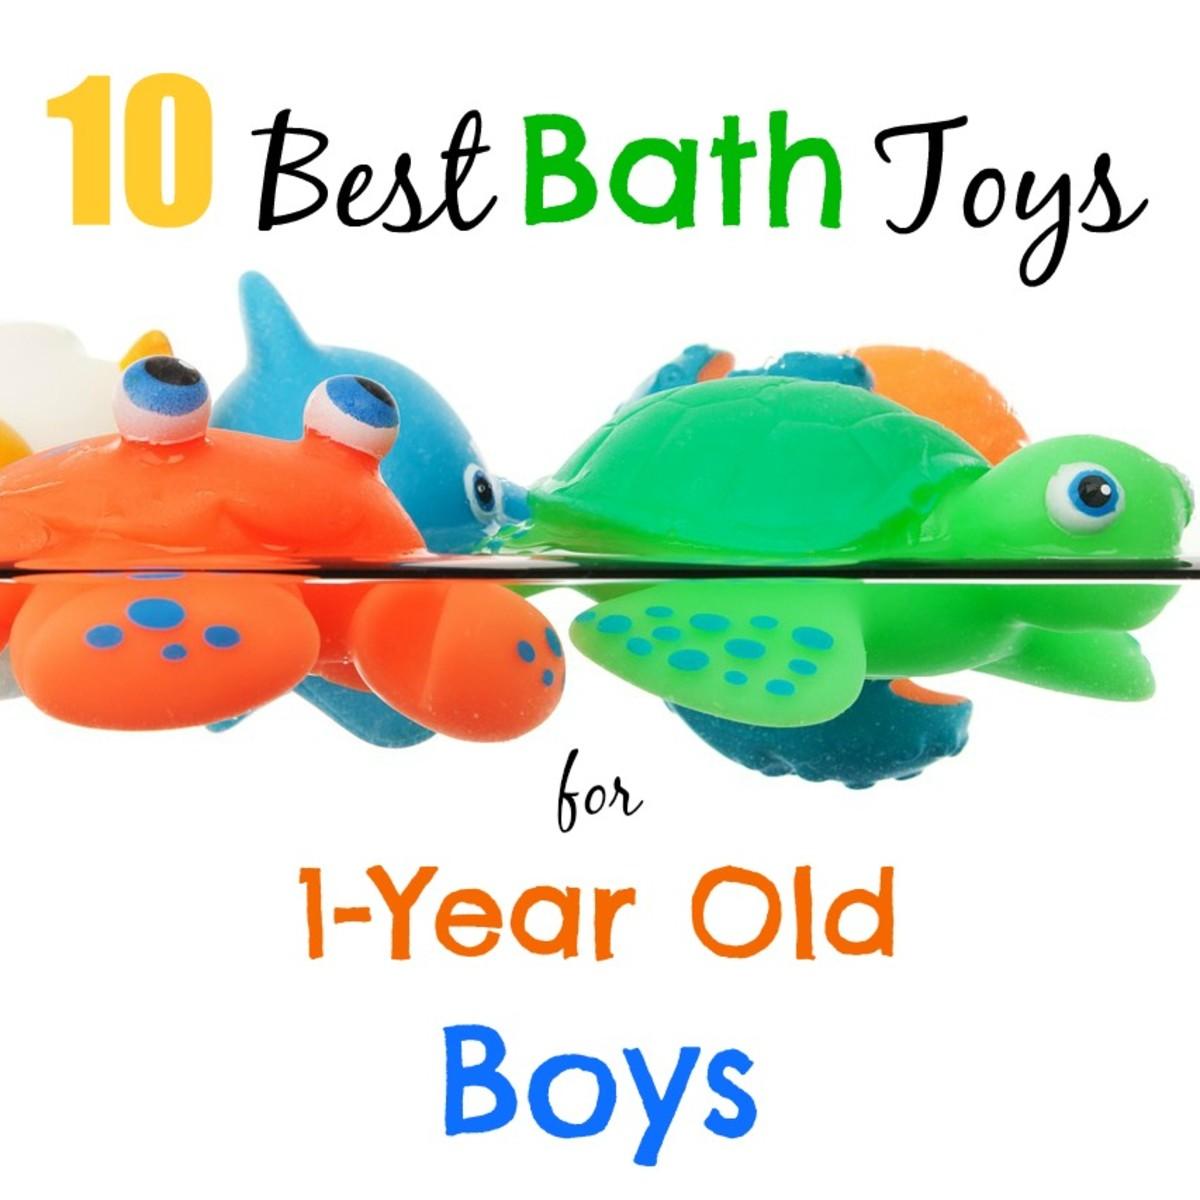 10-best-bath-toys-for-1-year-old-boys